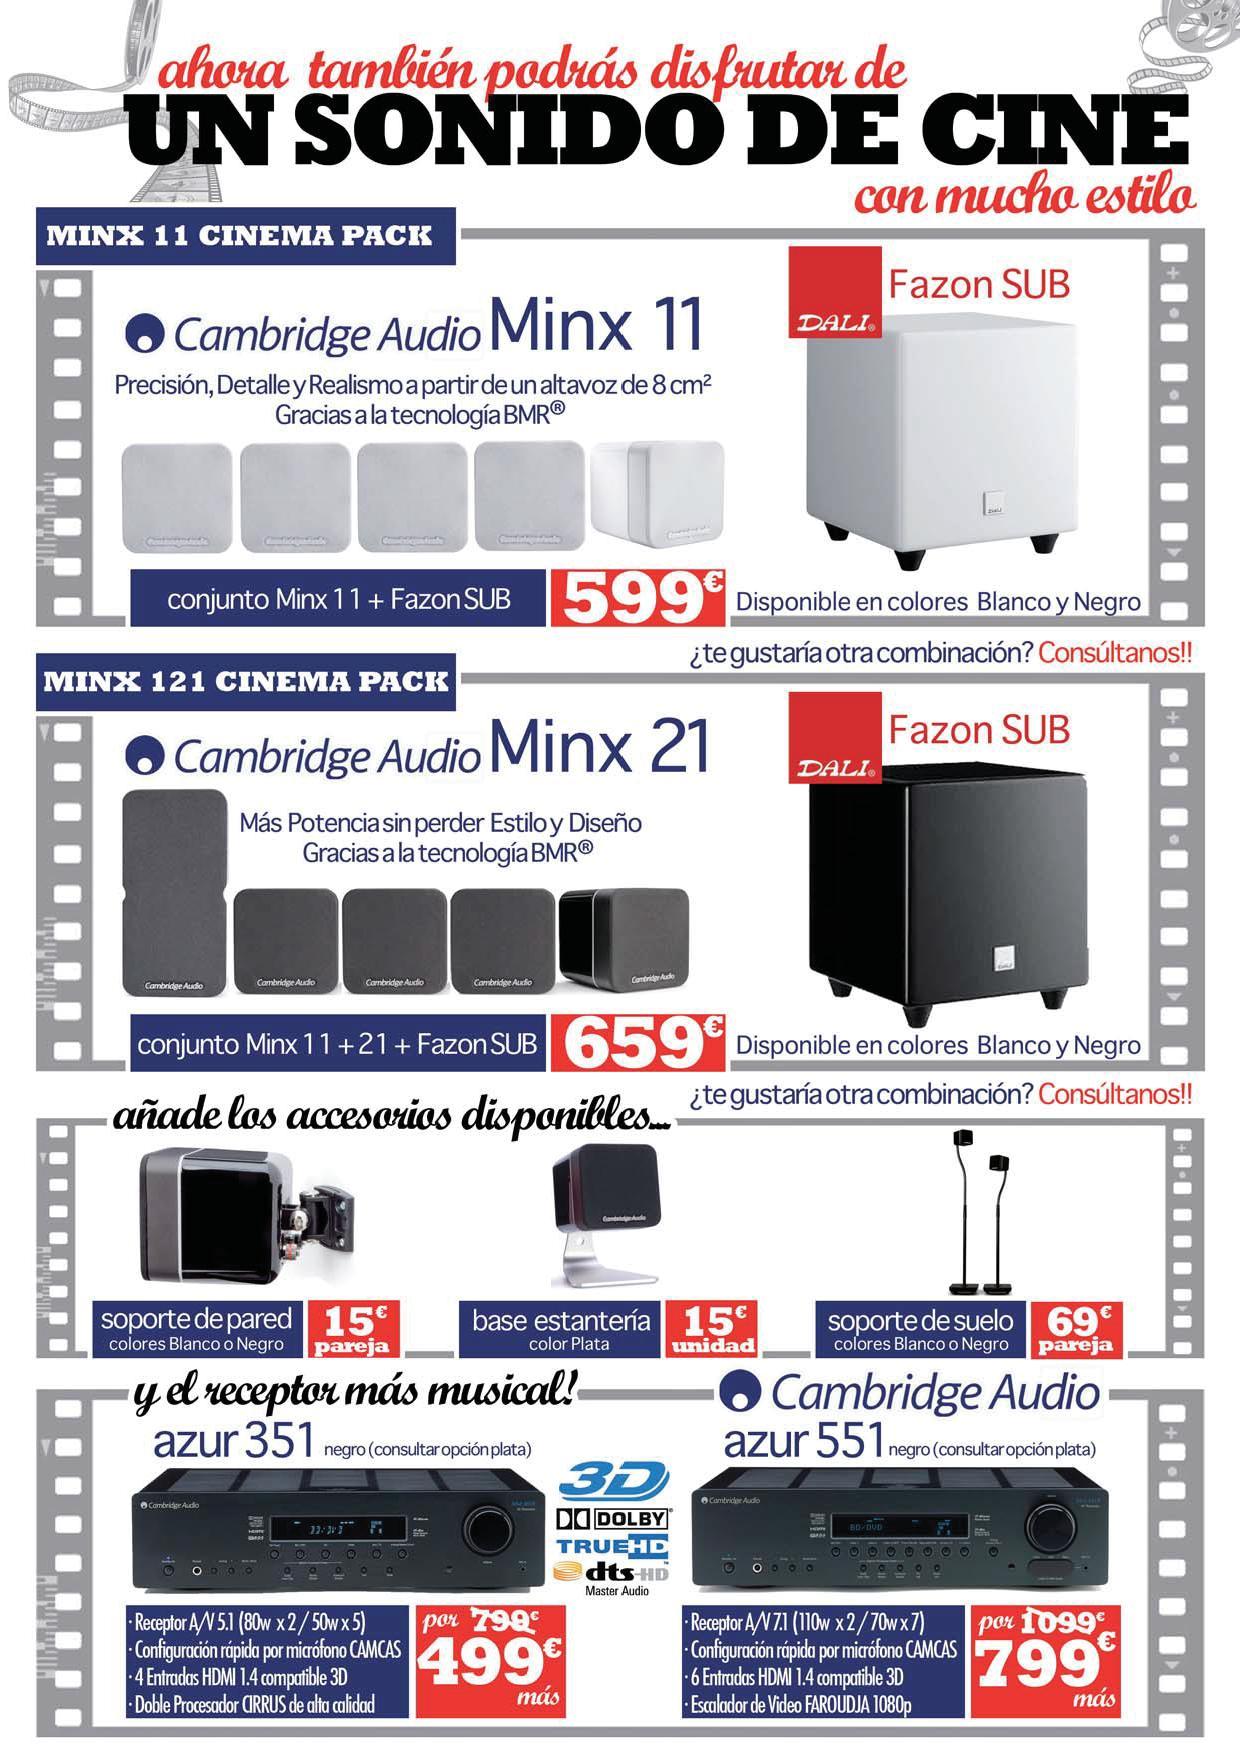 minx cinema pack